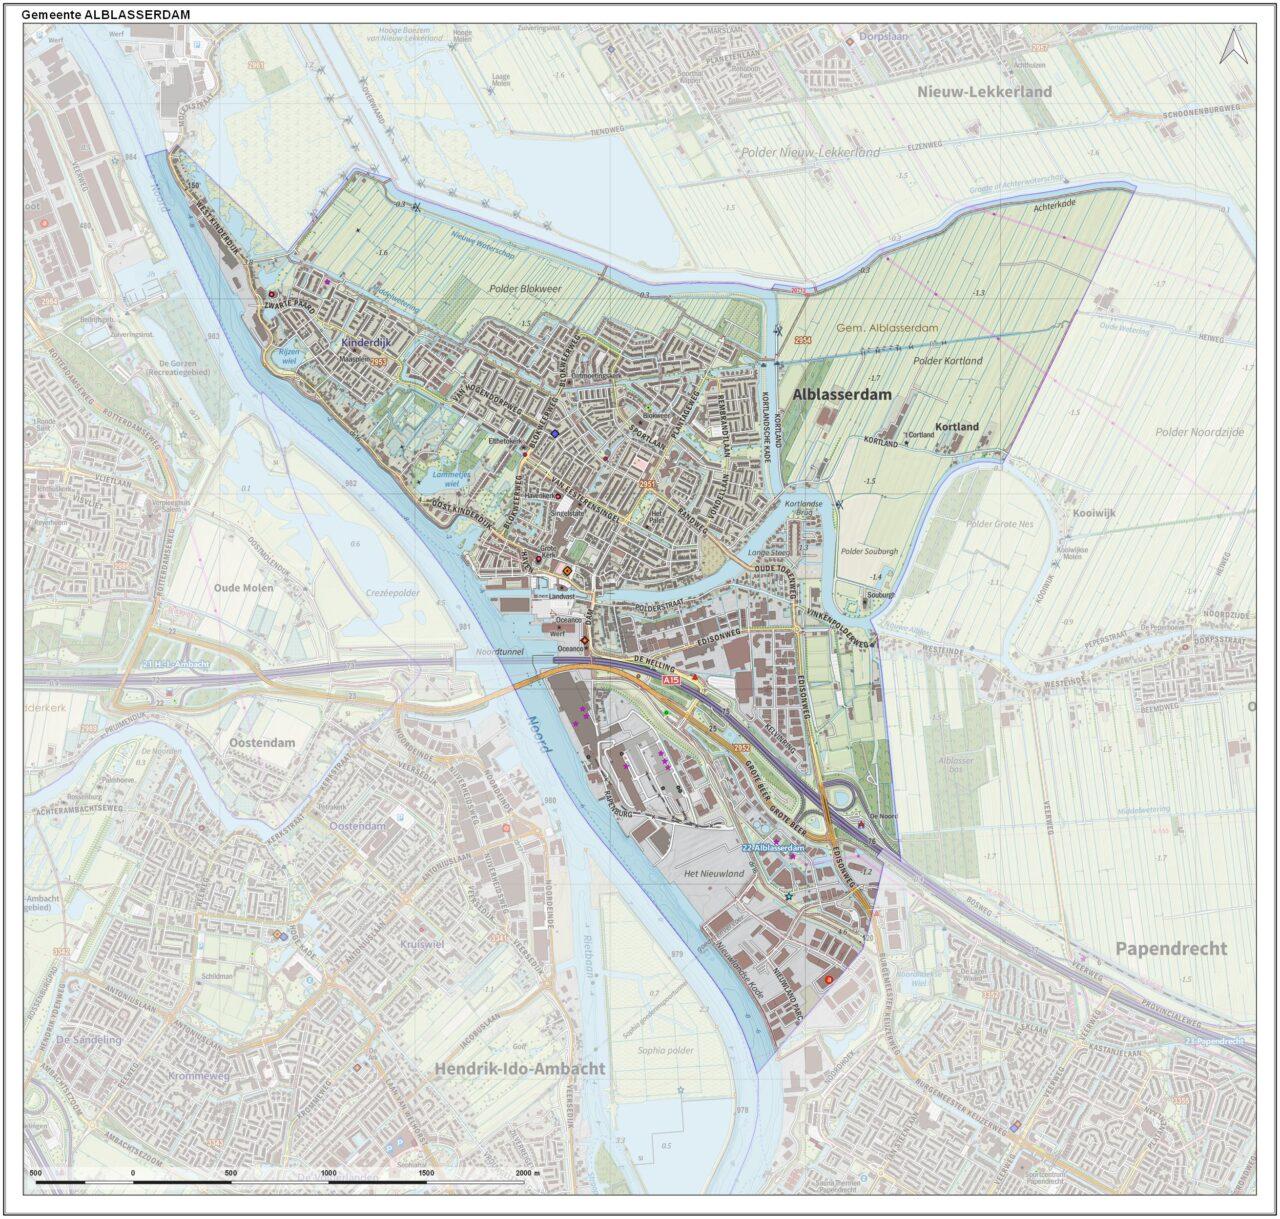 Gem-Alblasserdam-OpenTopo